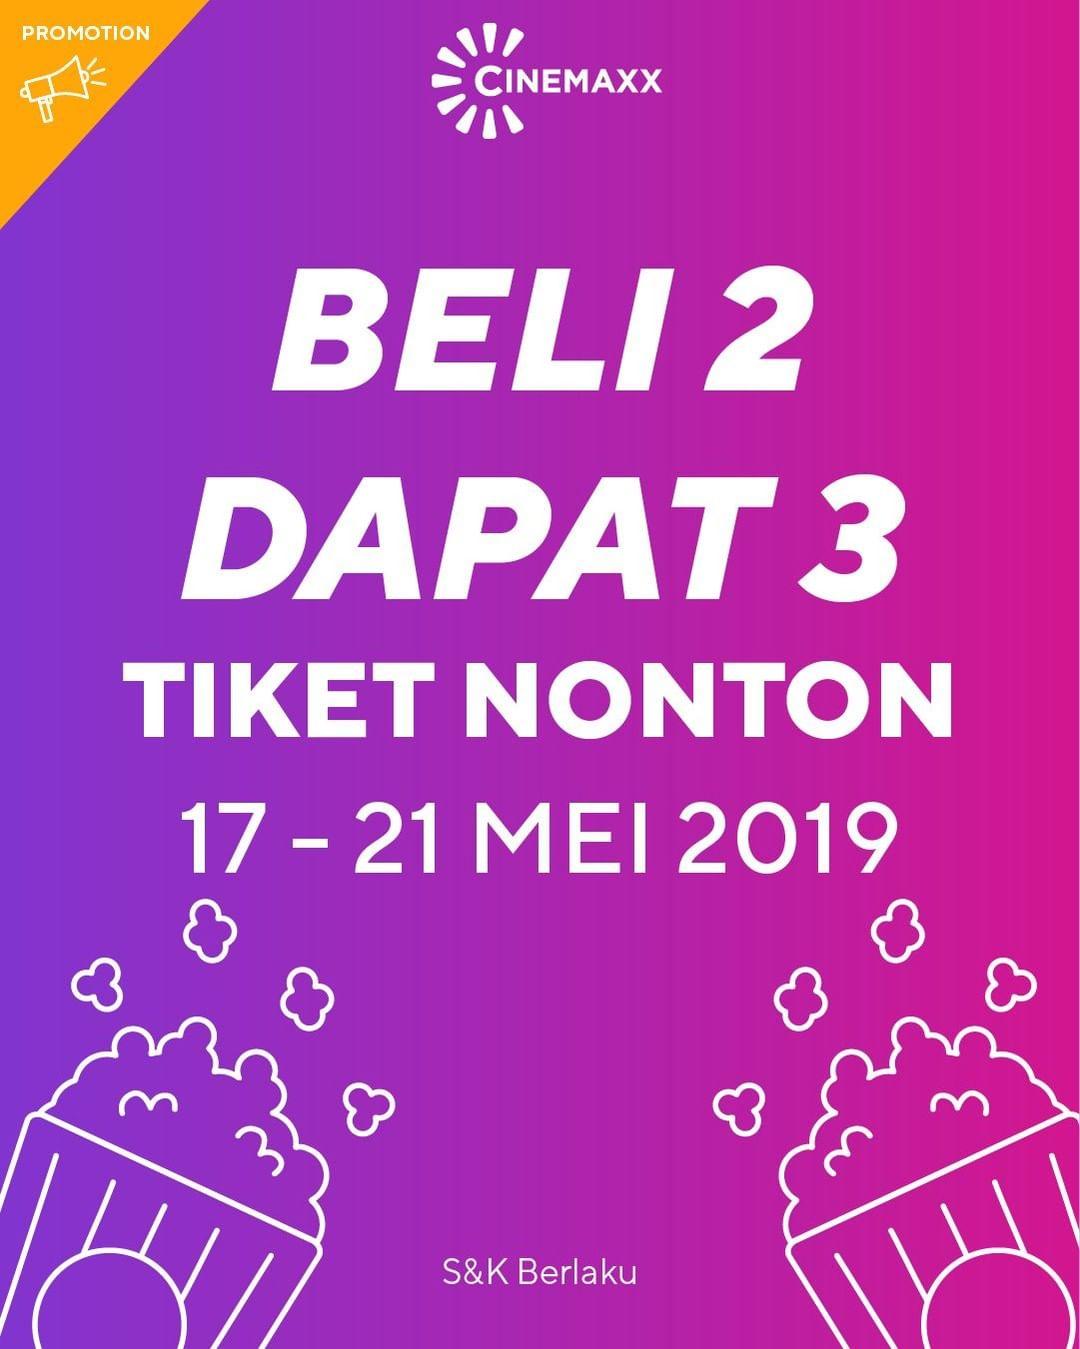 CINEMAXX THEATER Promo BELI 2 DAPAT 3 Tiket Nonton